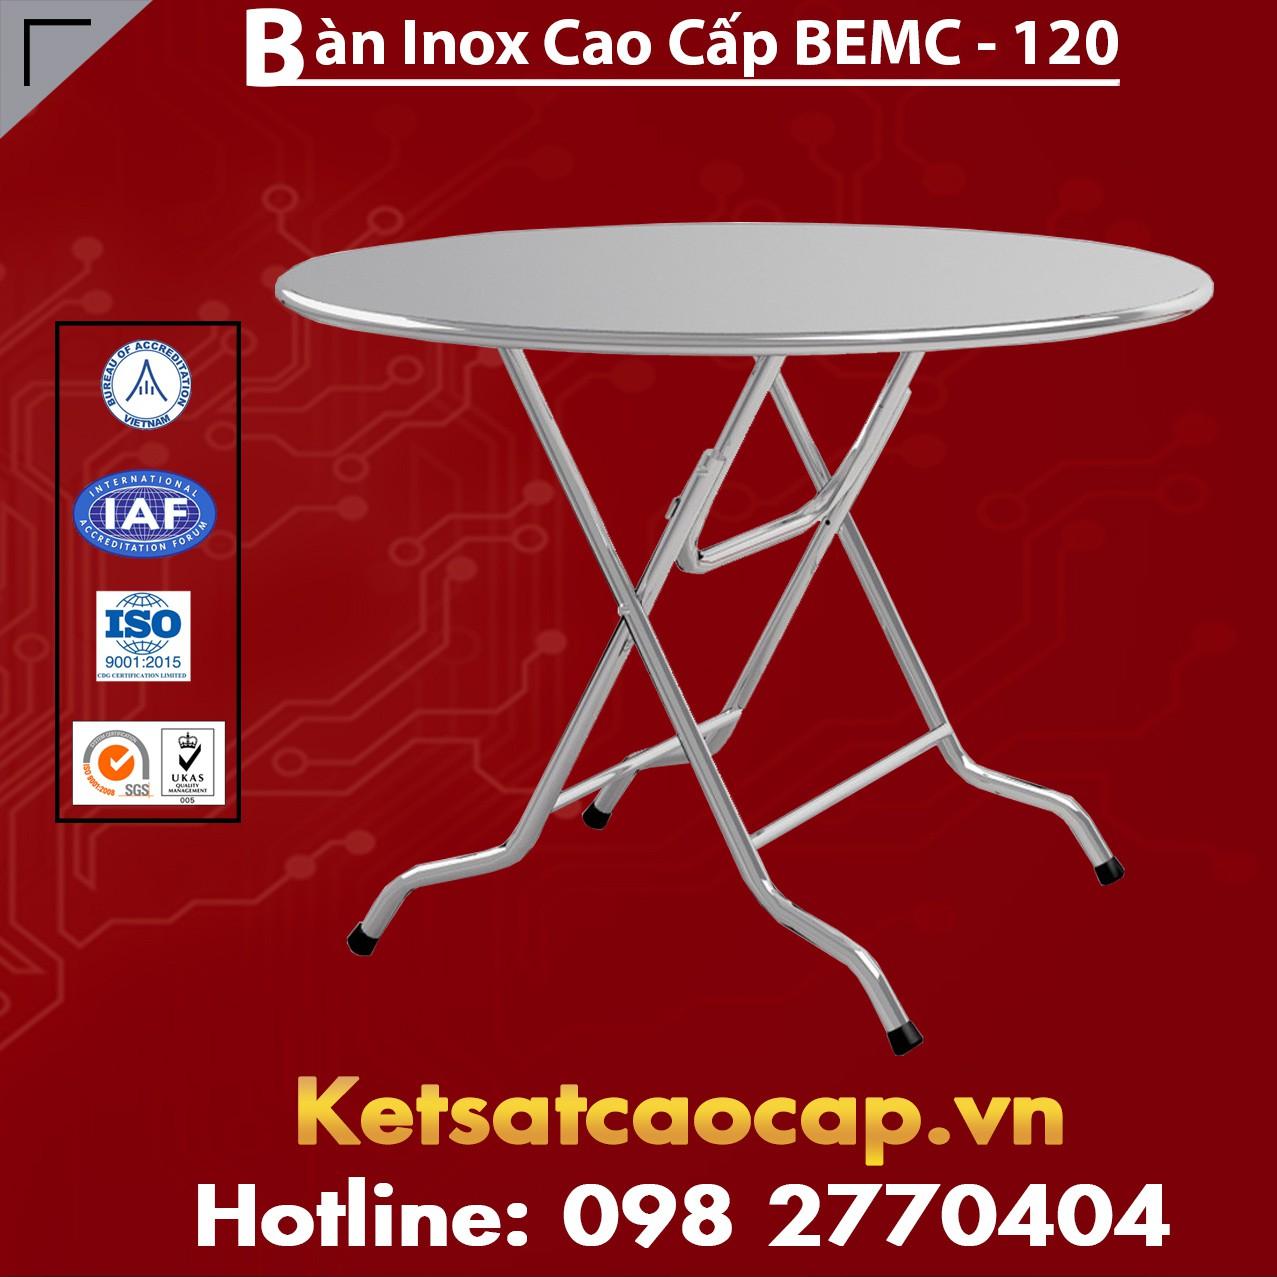 Bàn Inox Cao Cấp BEMC - 120